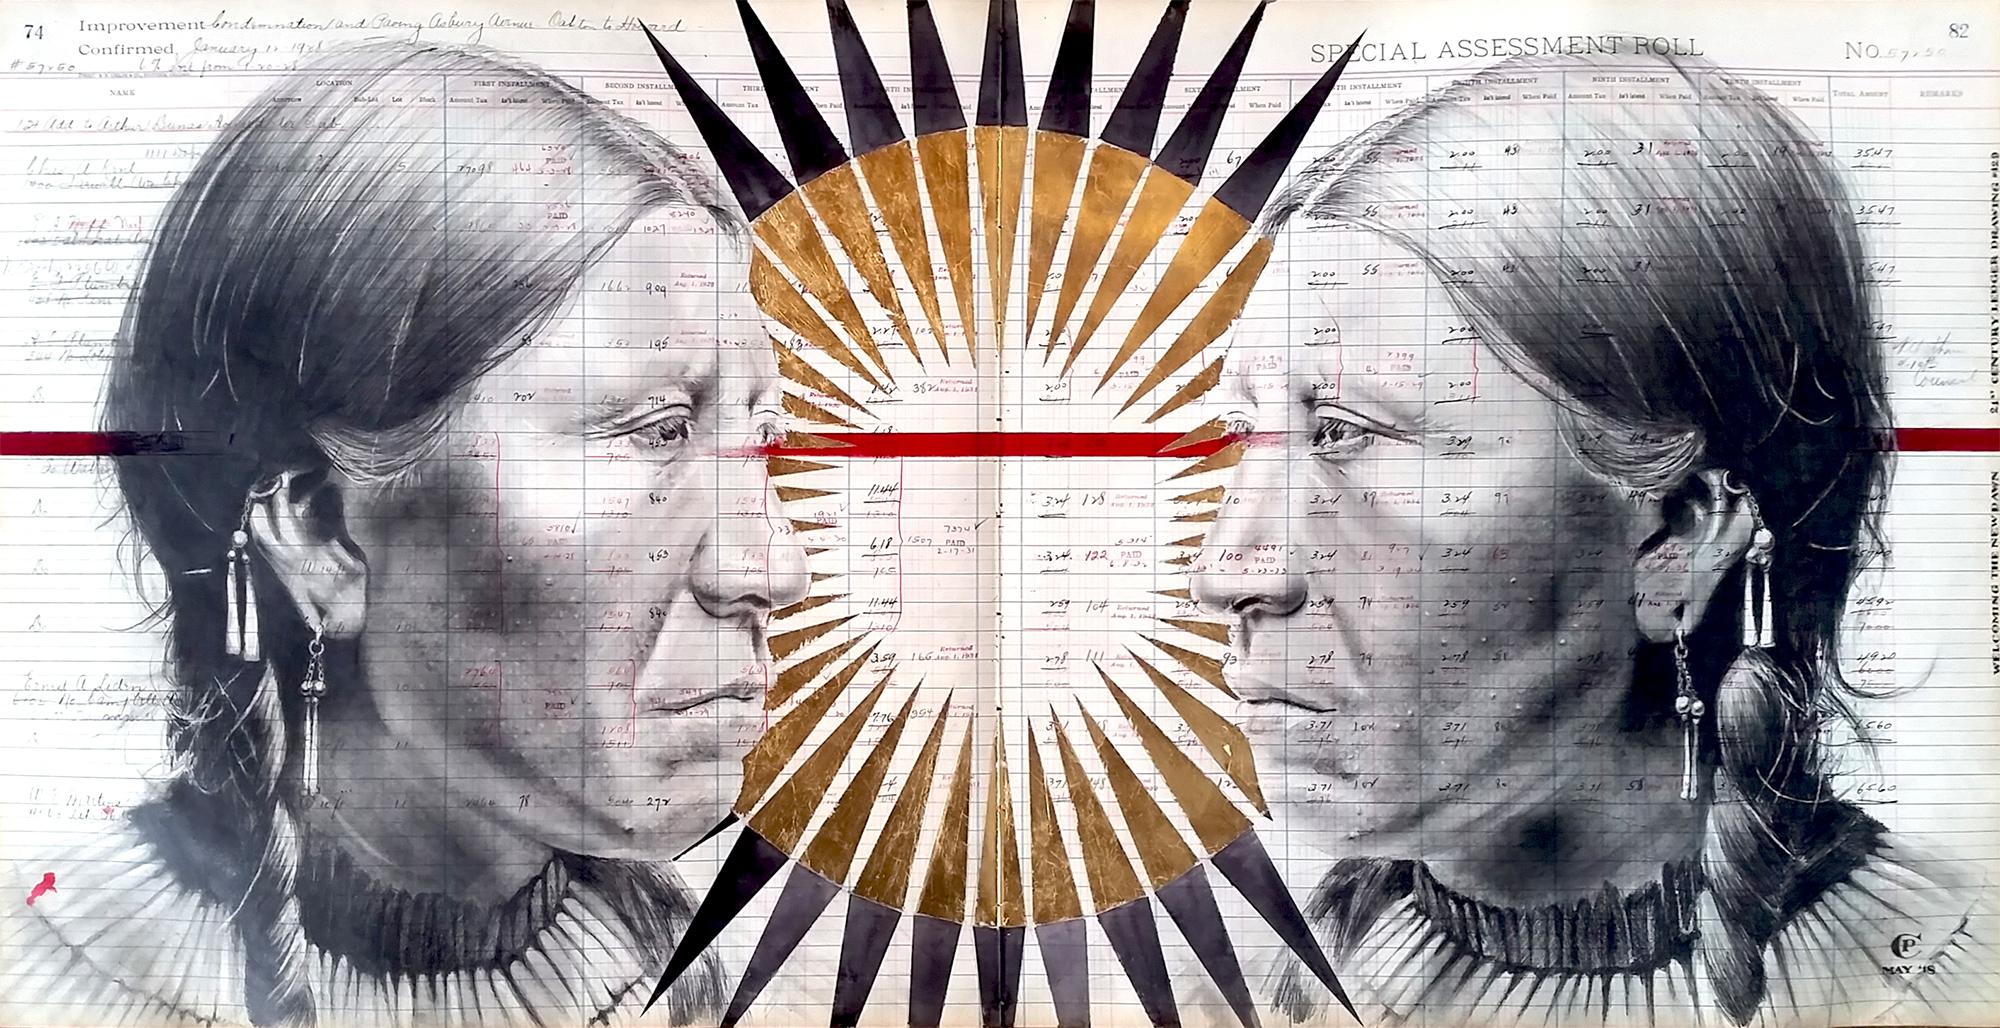 Subversively Elegant Portraits of Indigenous People Drawn on Repurposed Ledgers by Artist Chris Pappan